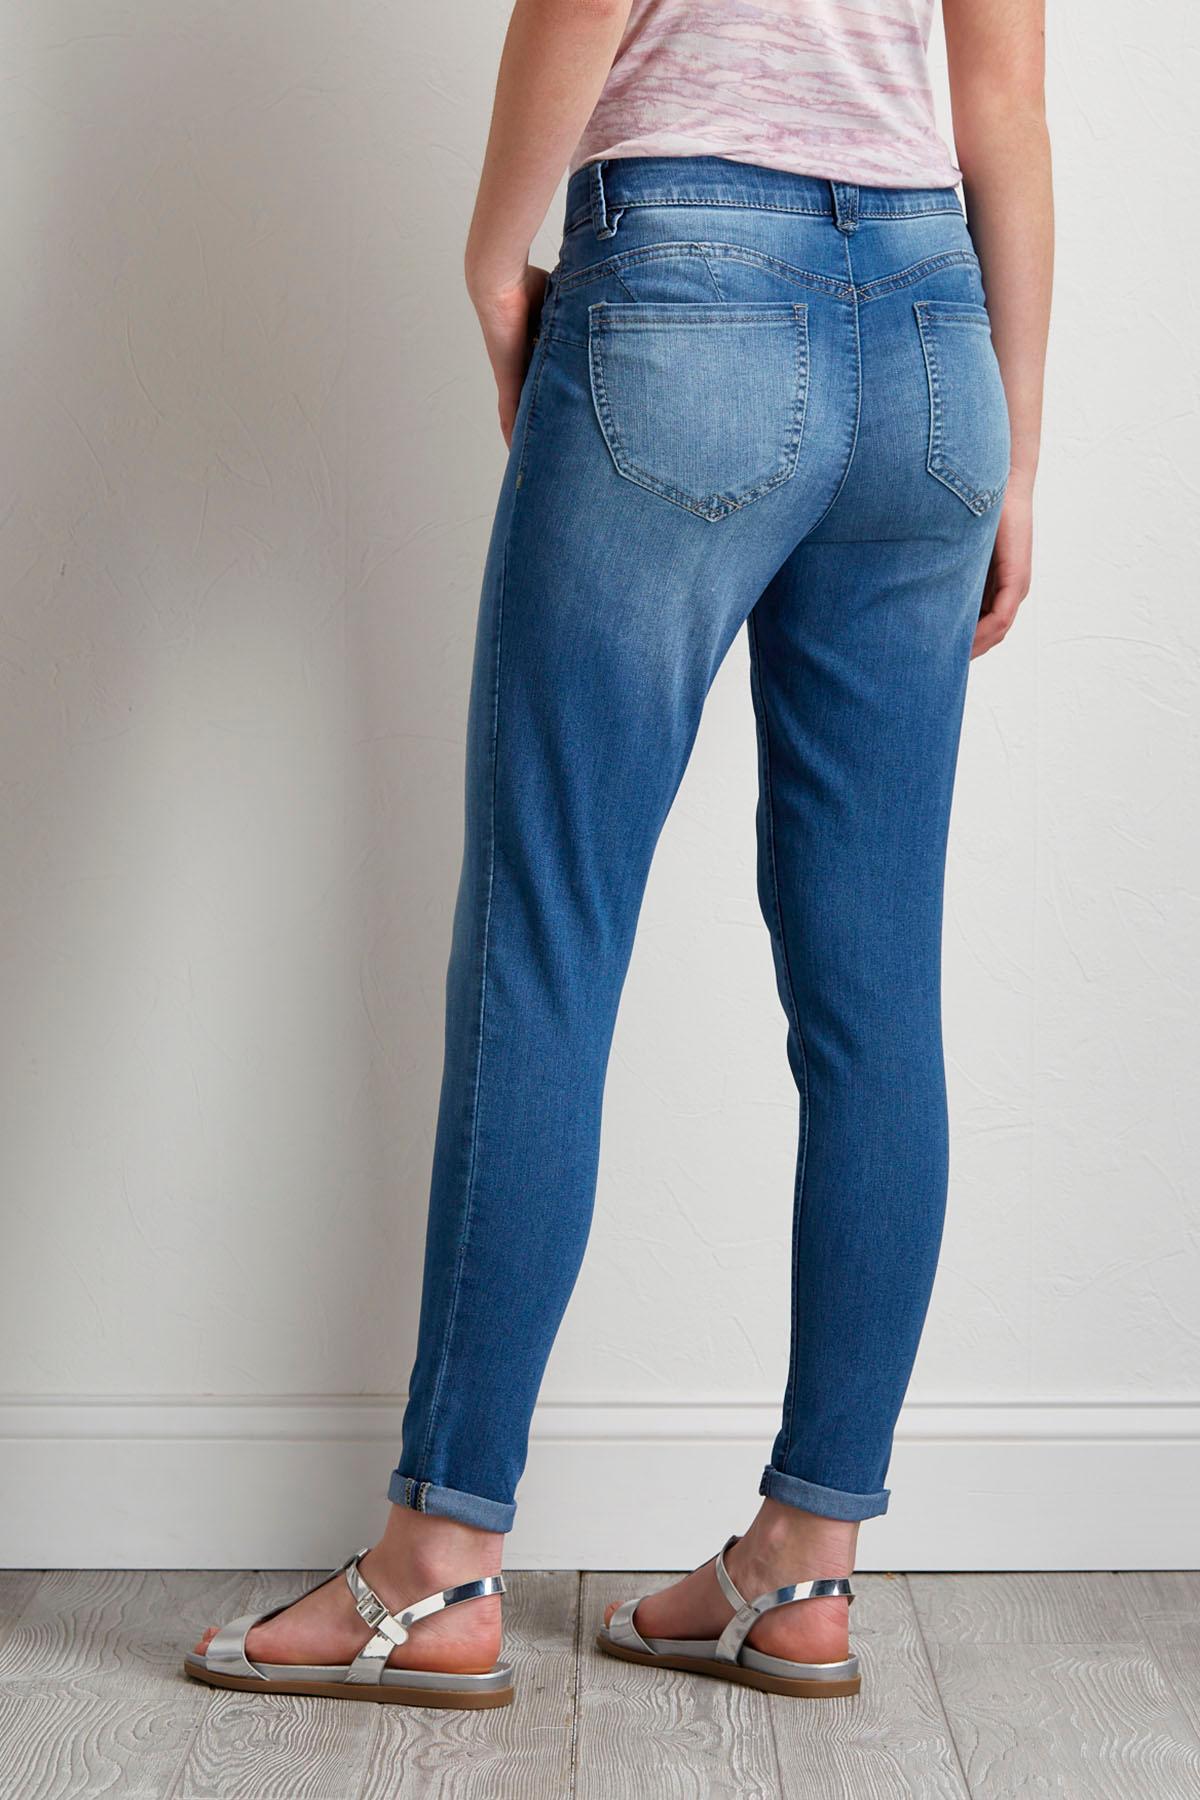 Shape Enhancing Ankle Jeans